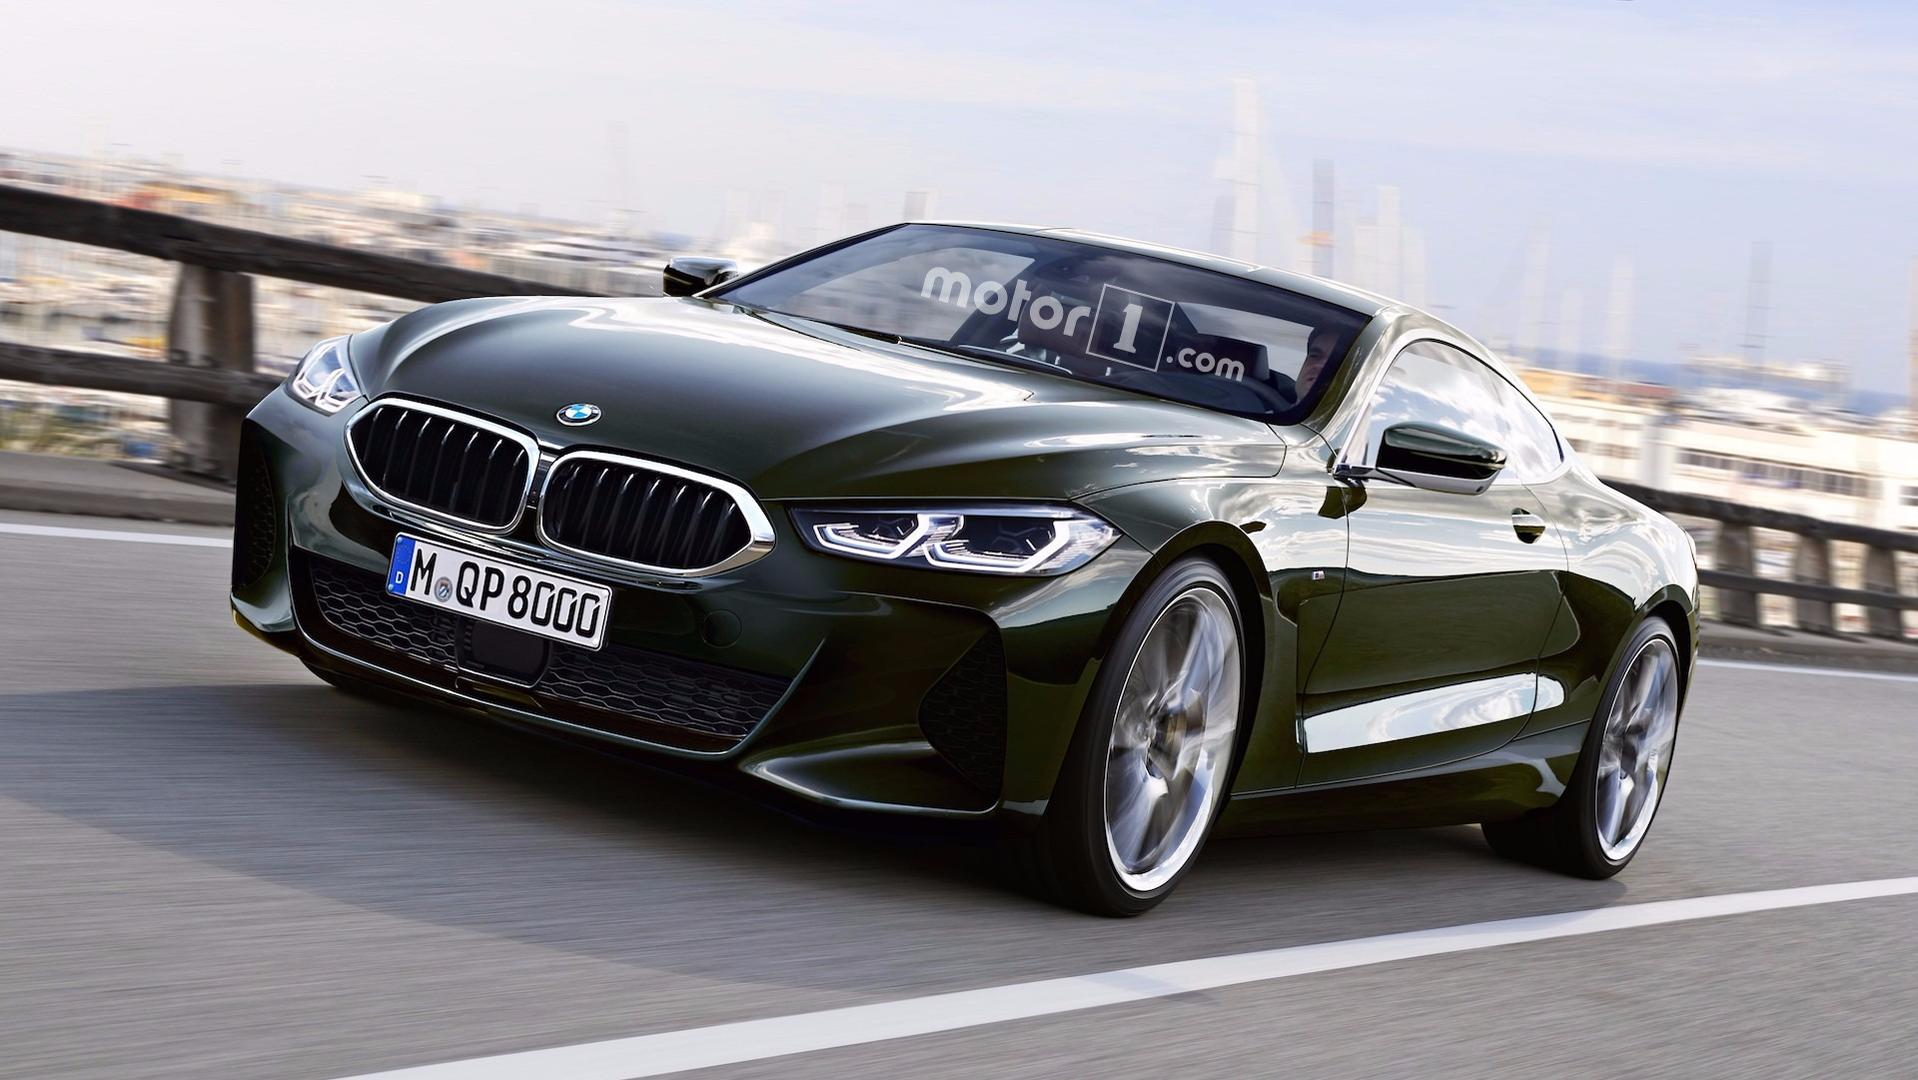 NextGen BMW Series Spied Without Camouflage In Leaked Photos - 8 series bmw